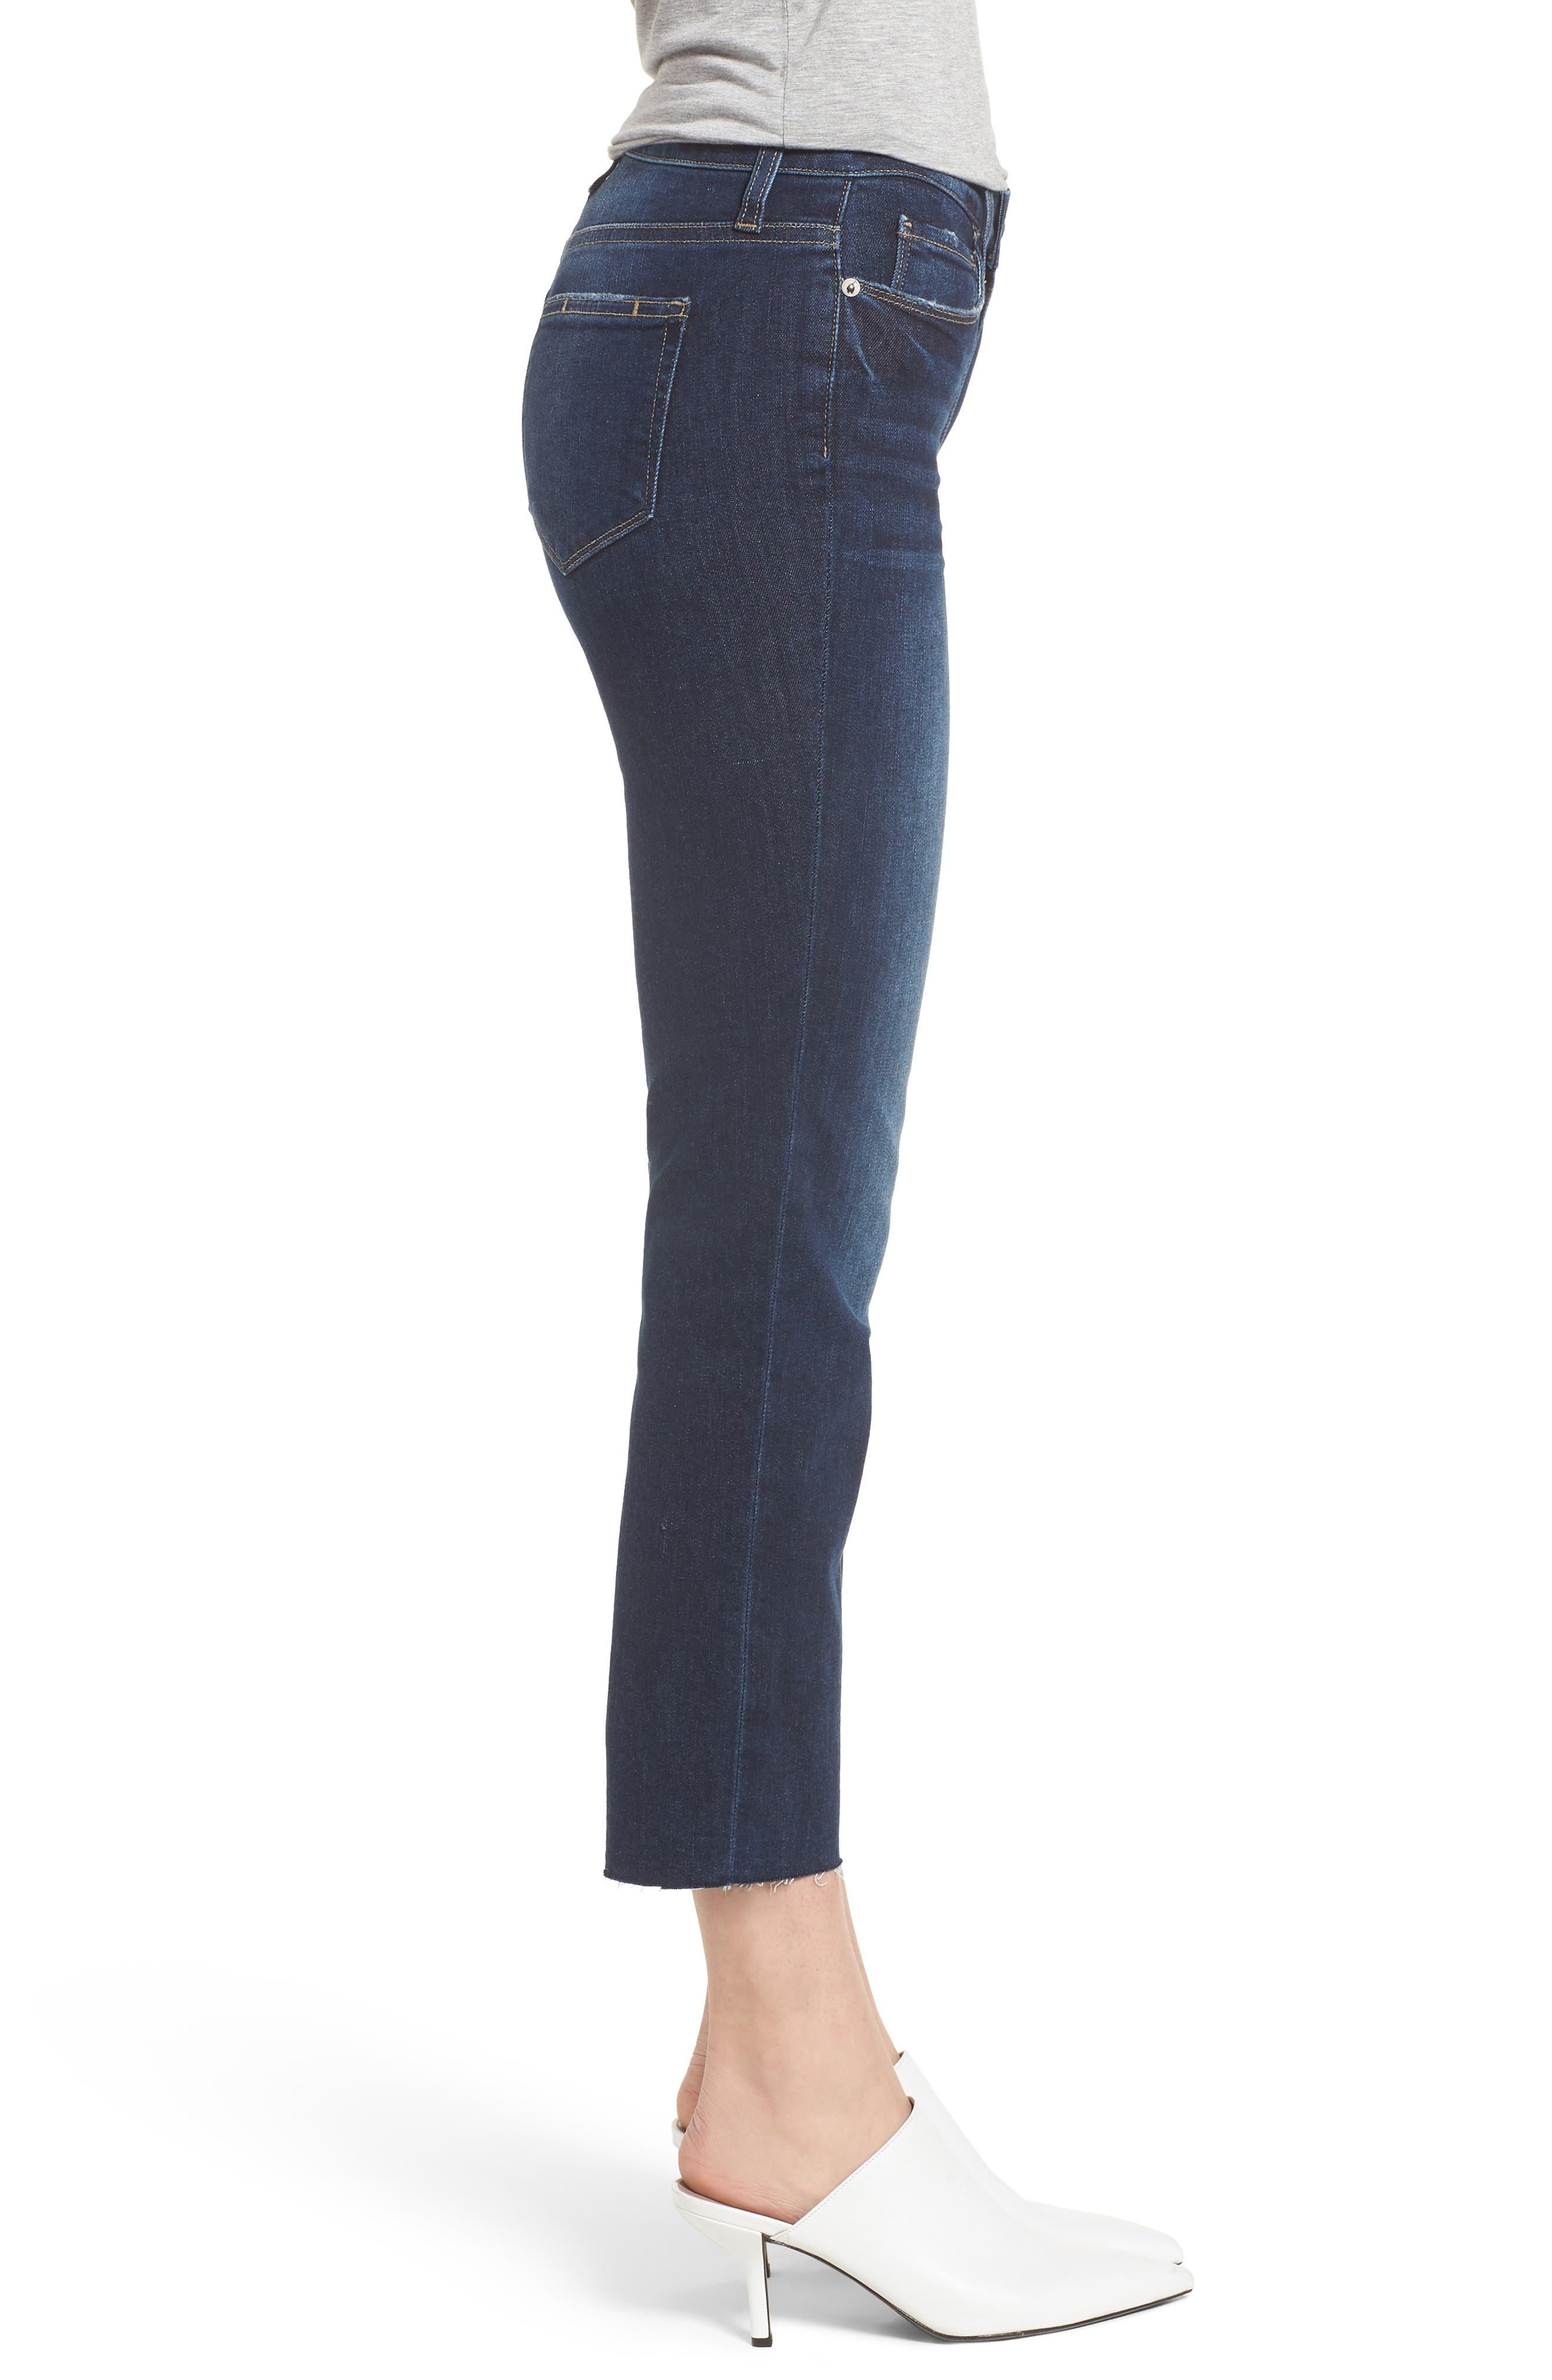 Hoxton High Waist Crop Straight Leg Jeans,                             Alternate thumbnail 3, color,                             Mazzetti